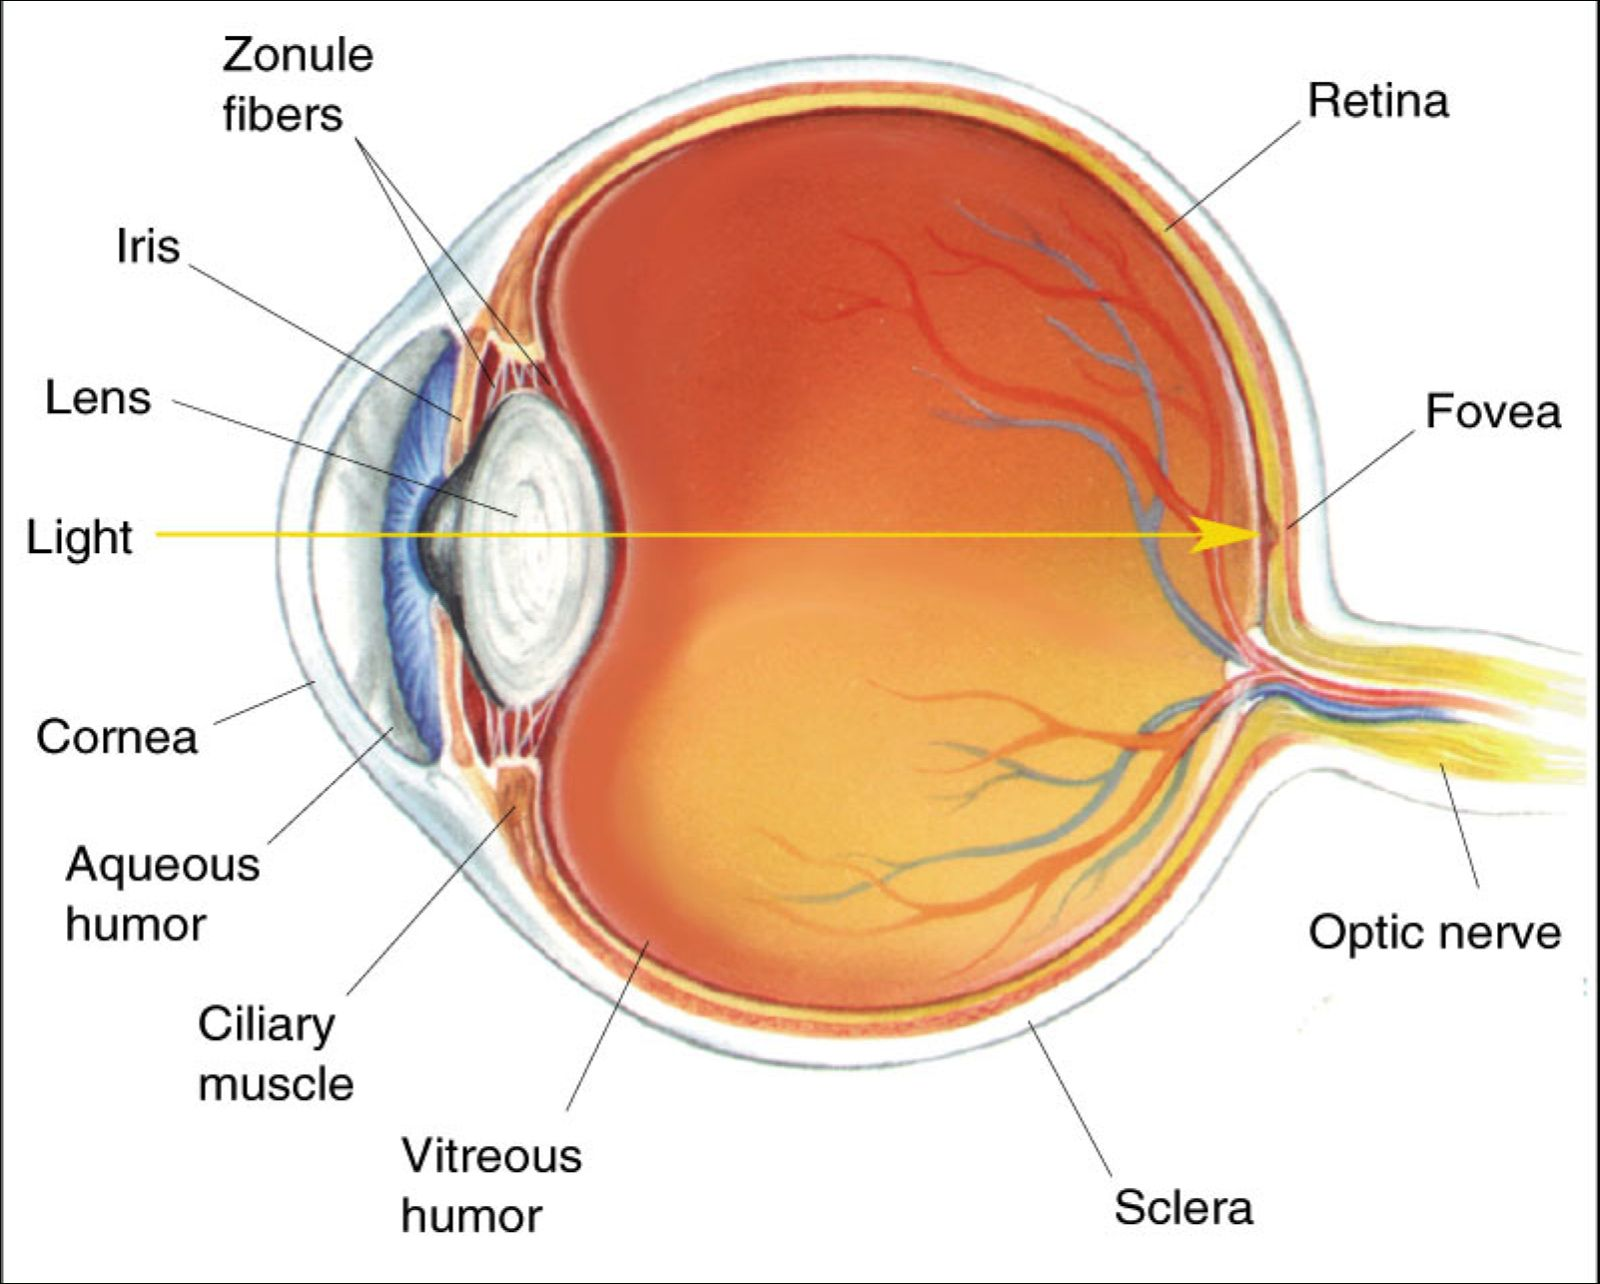 Eye Diagram Unlabelled Human Eye Diagram Unlabelled With